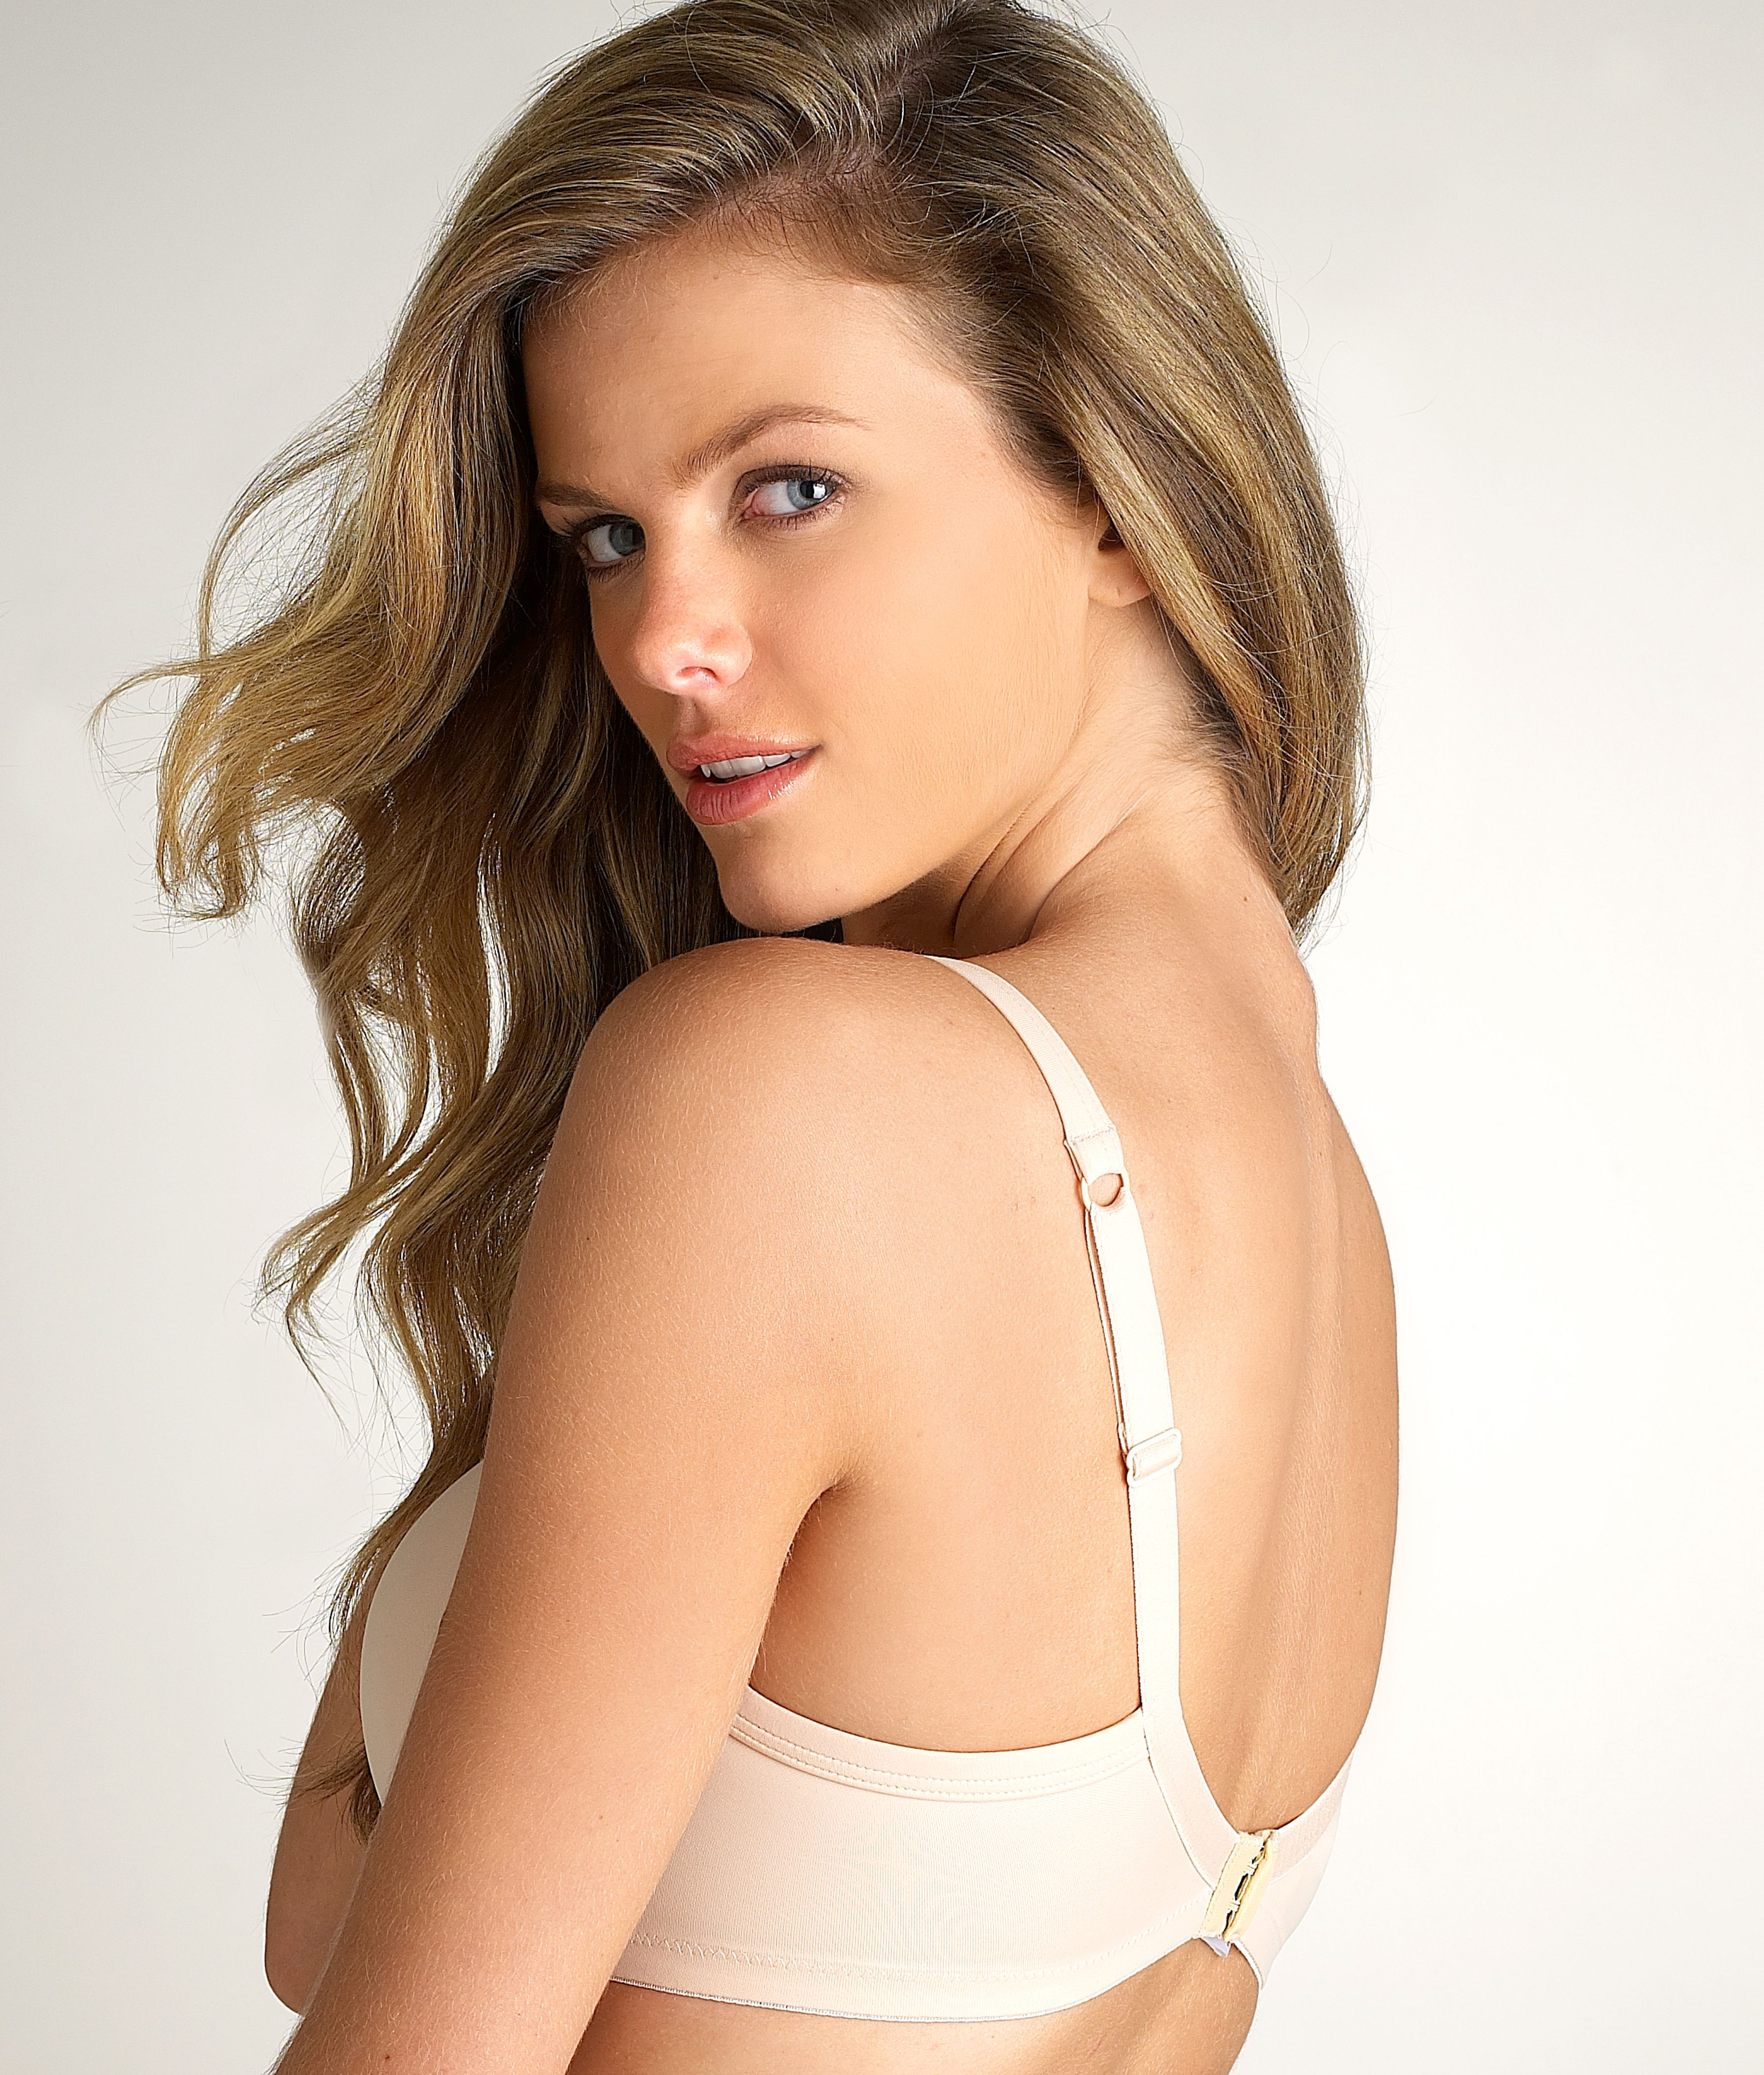 Digitalminx Com Models Brooklyn Decker Page 1